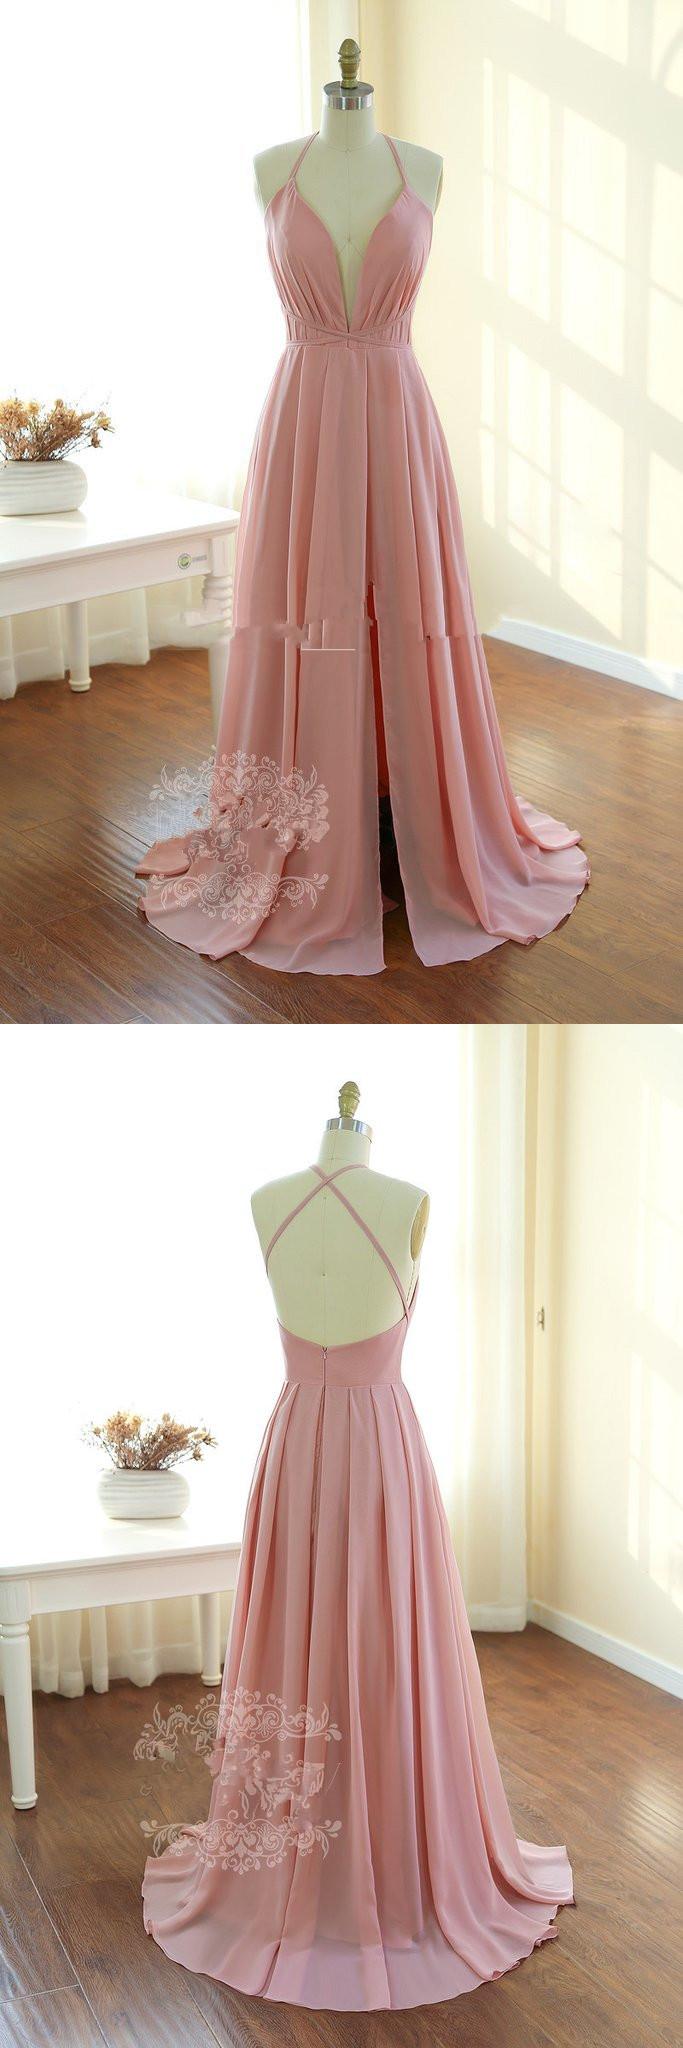 V neck long prom dress pink long homecoming dress backless